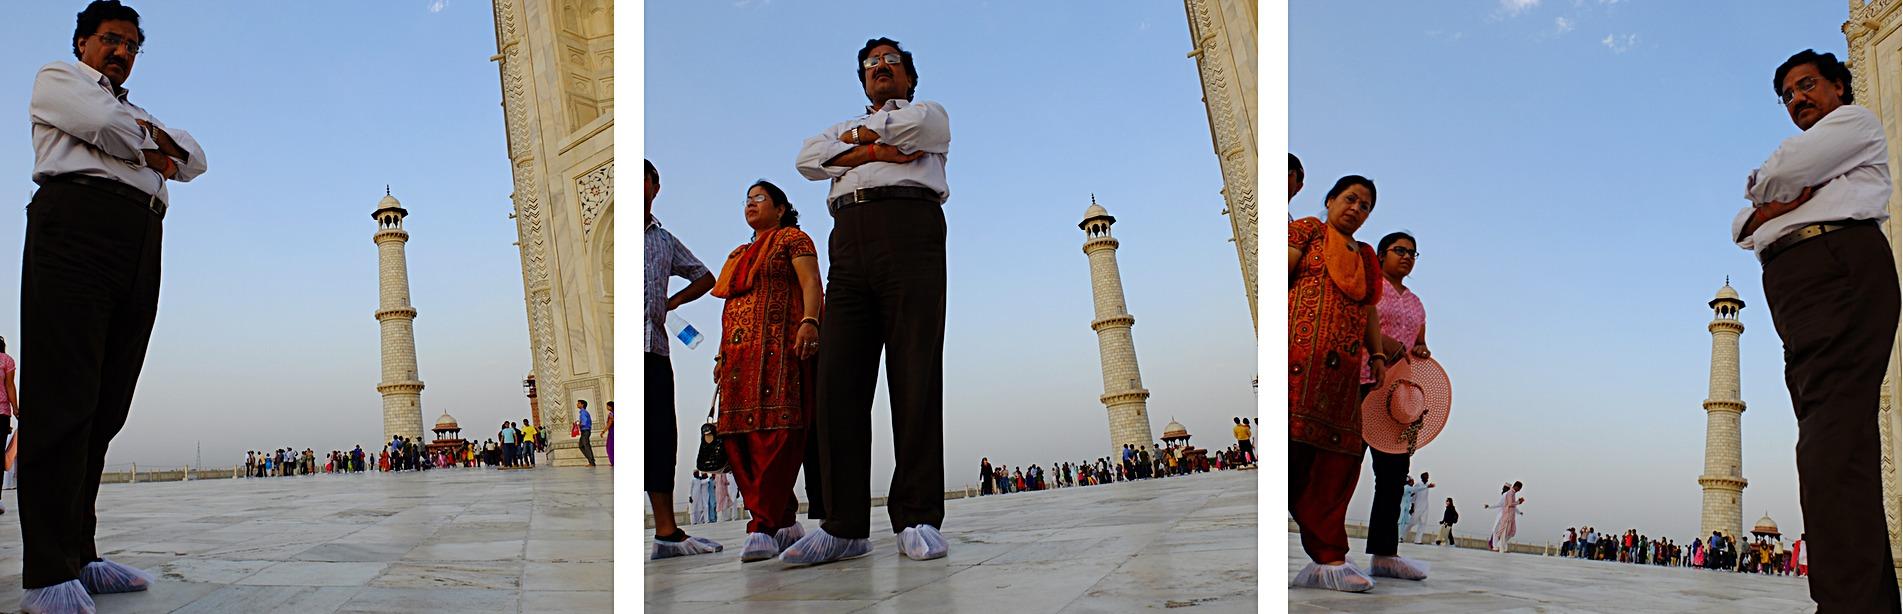 Taj_Mahal_Agra_11